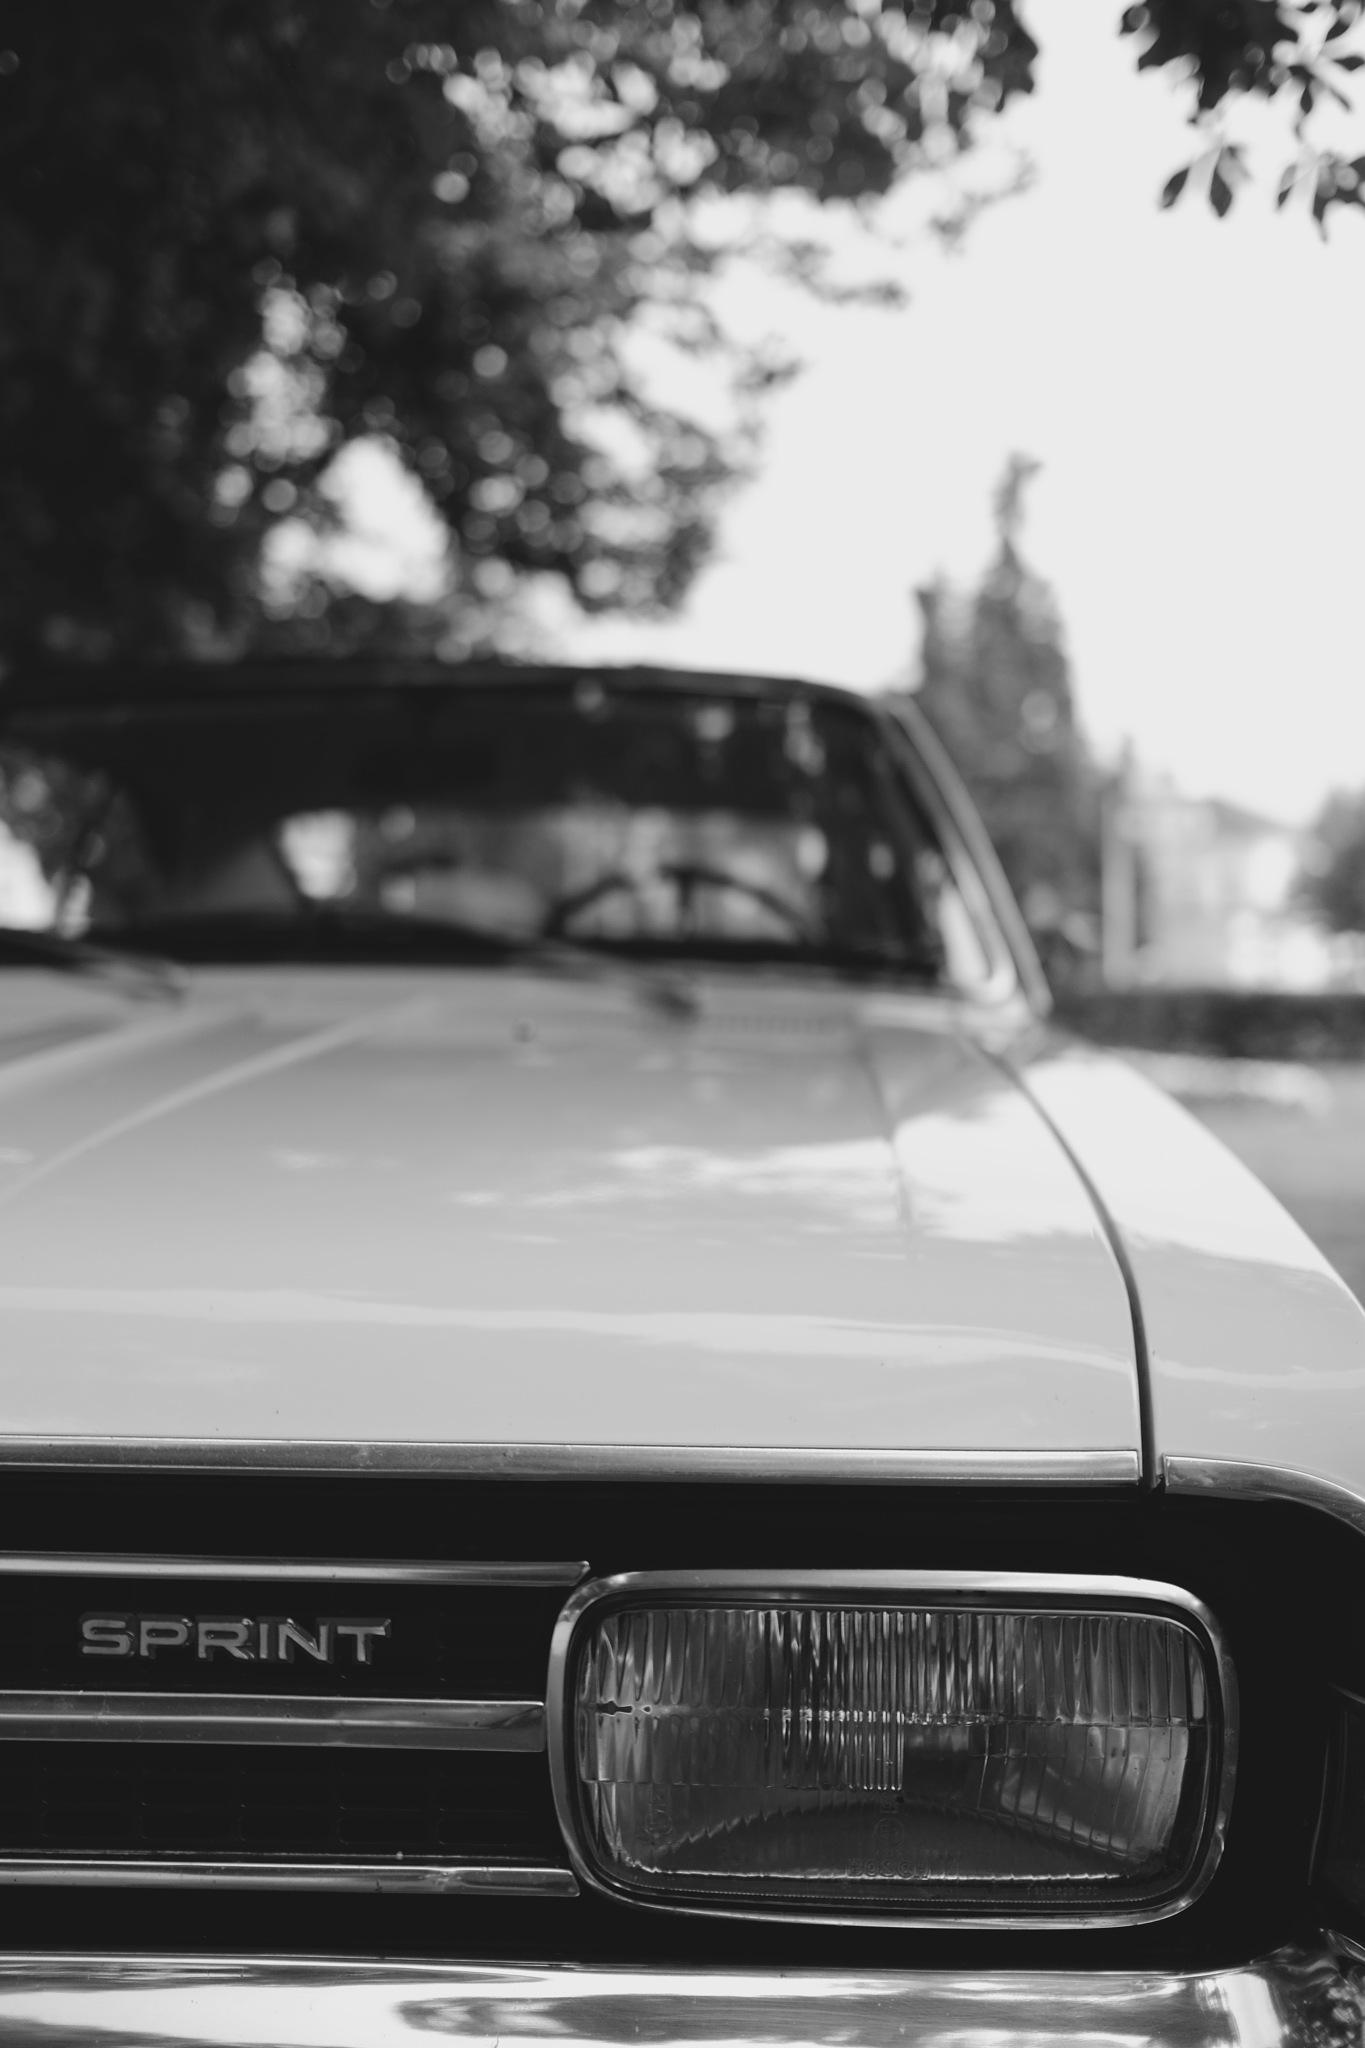 Opel by peterkryzun